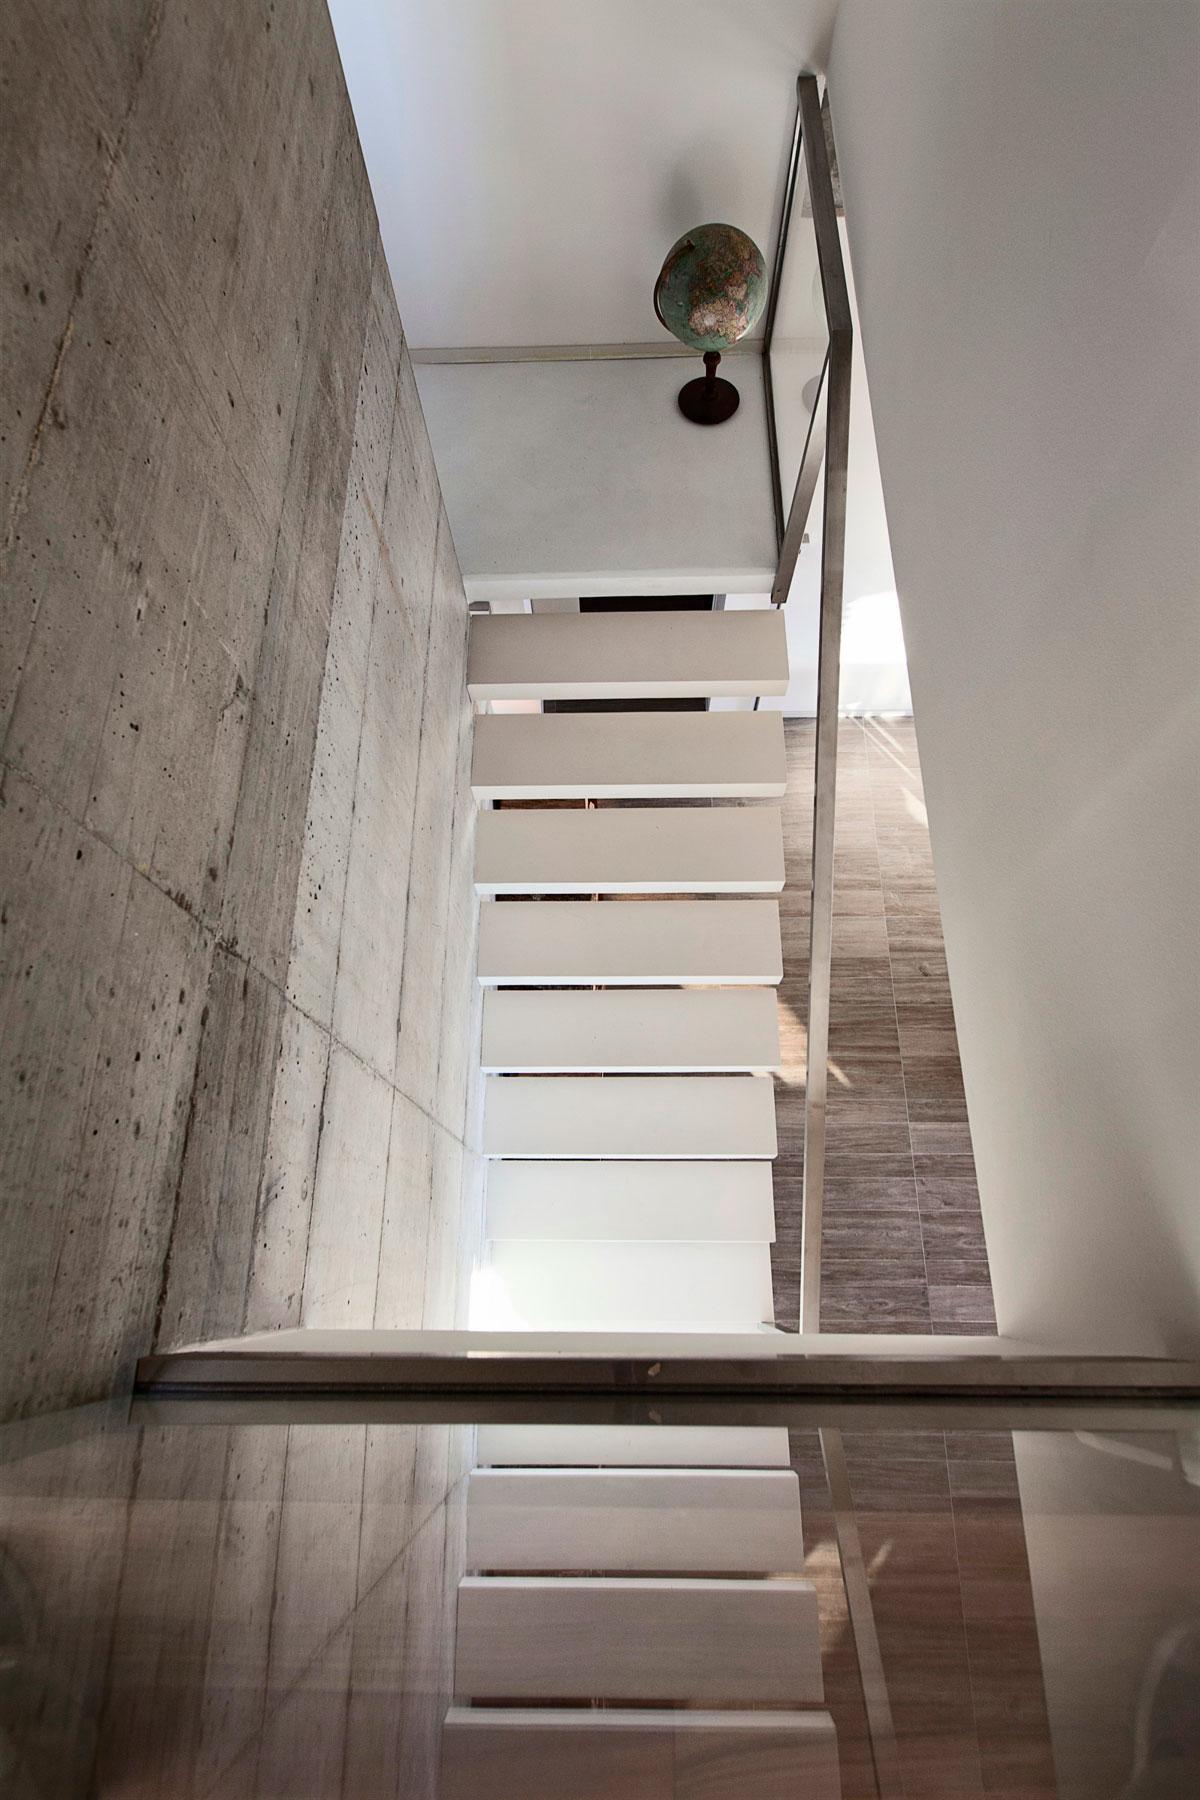 D'Autore Residence near Bologna by Giraldi Associati Architetti-36